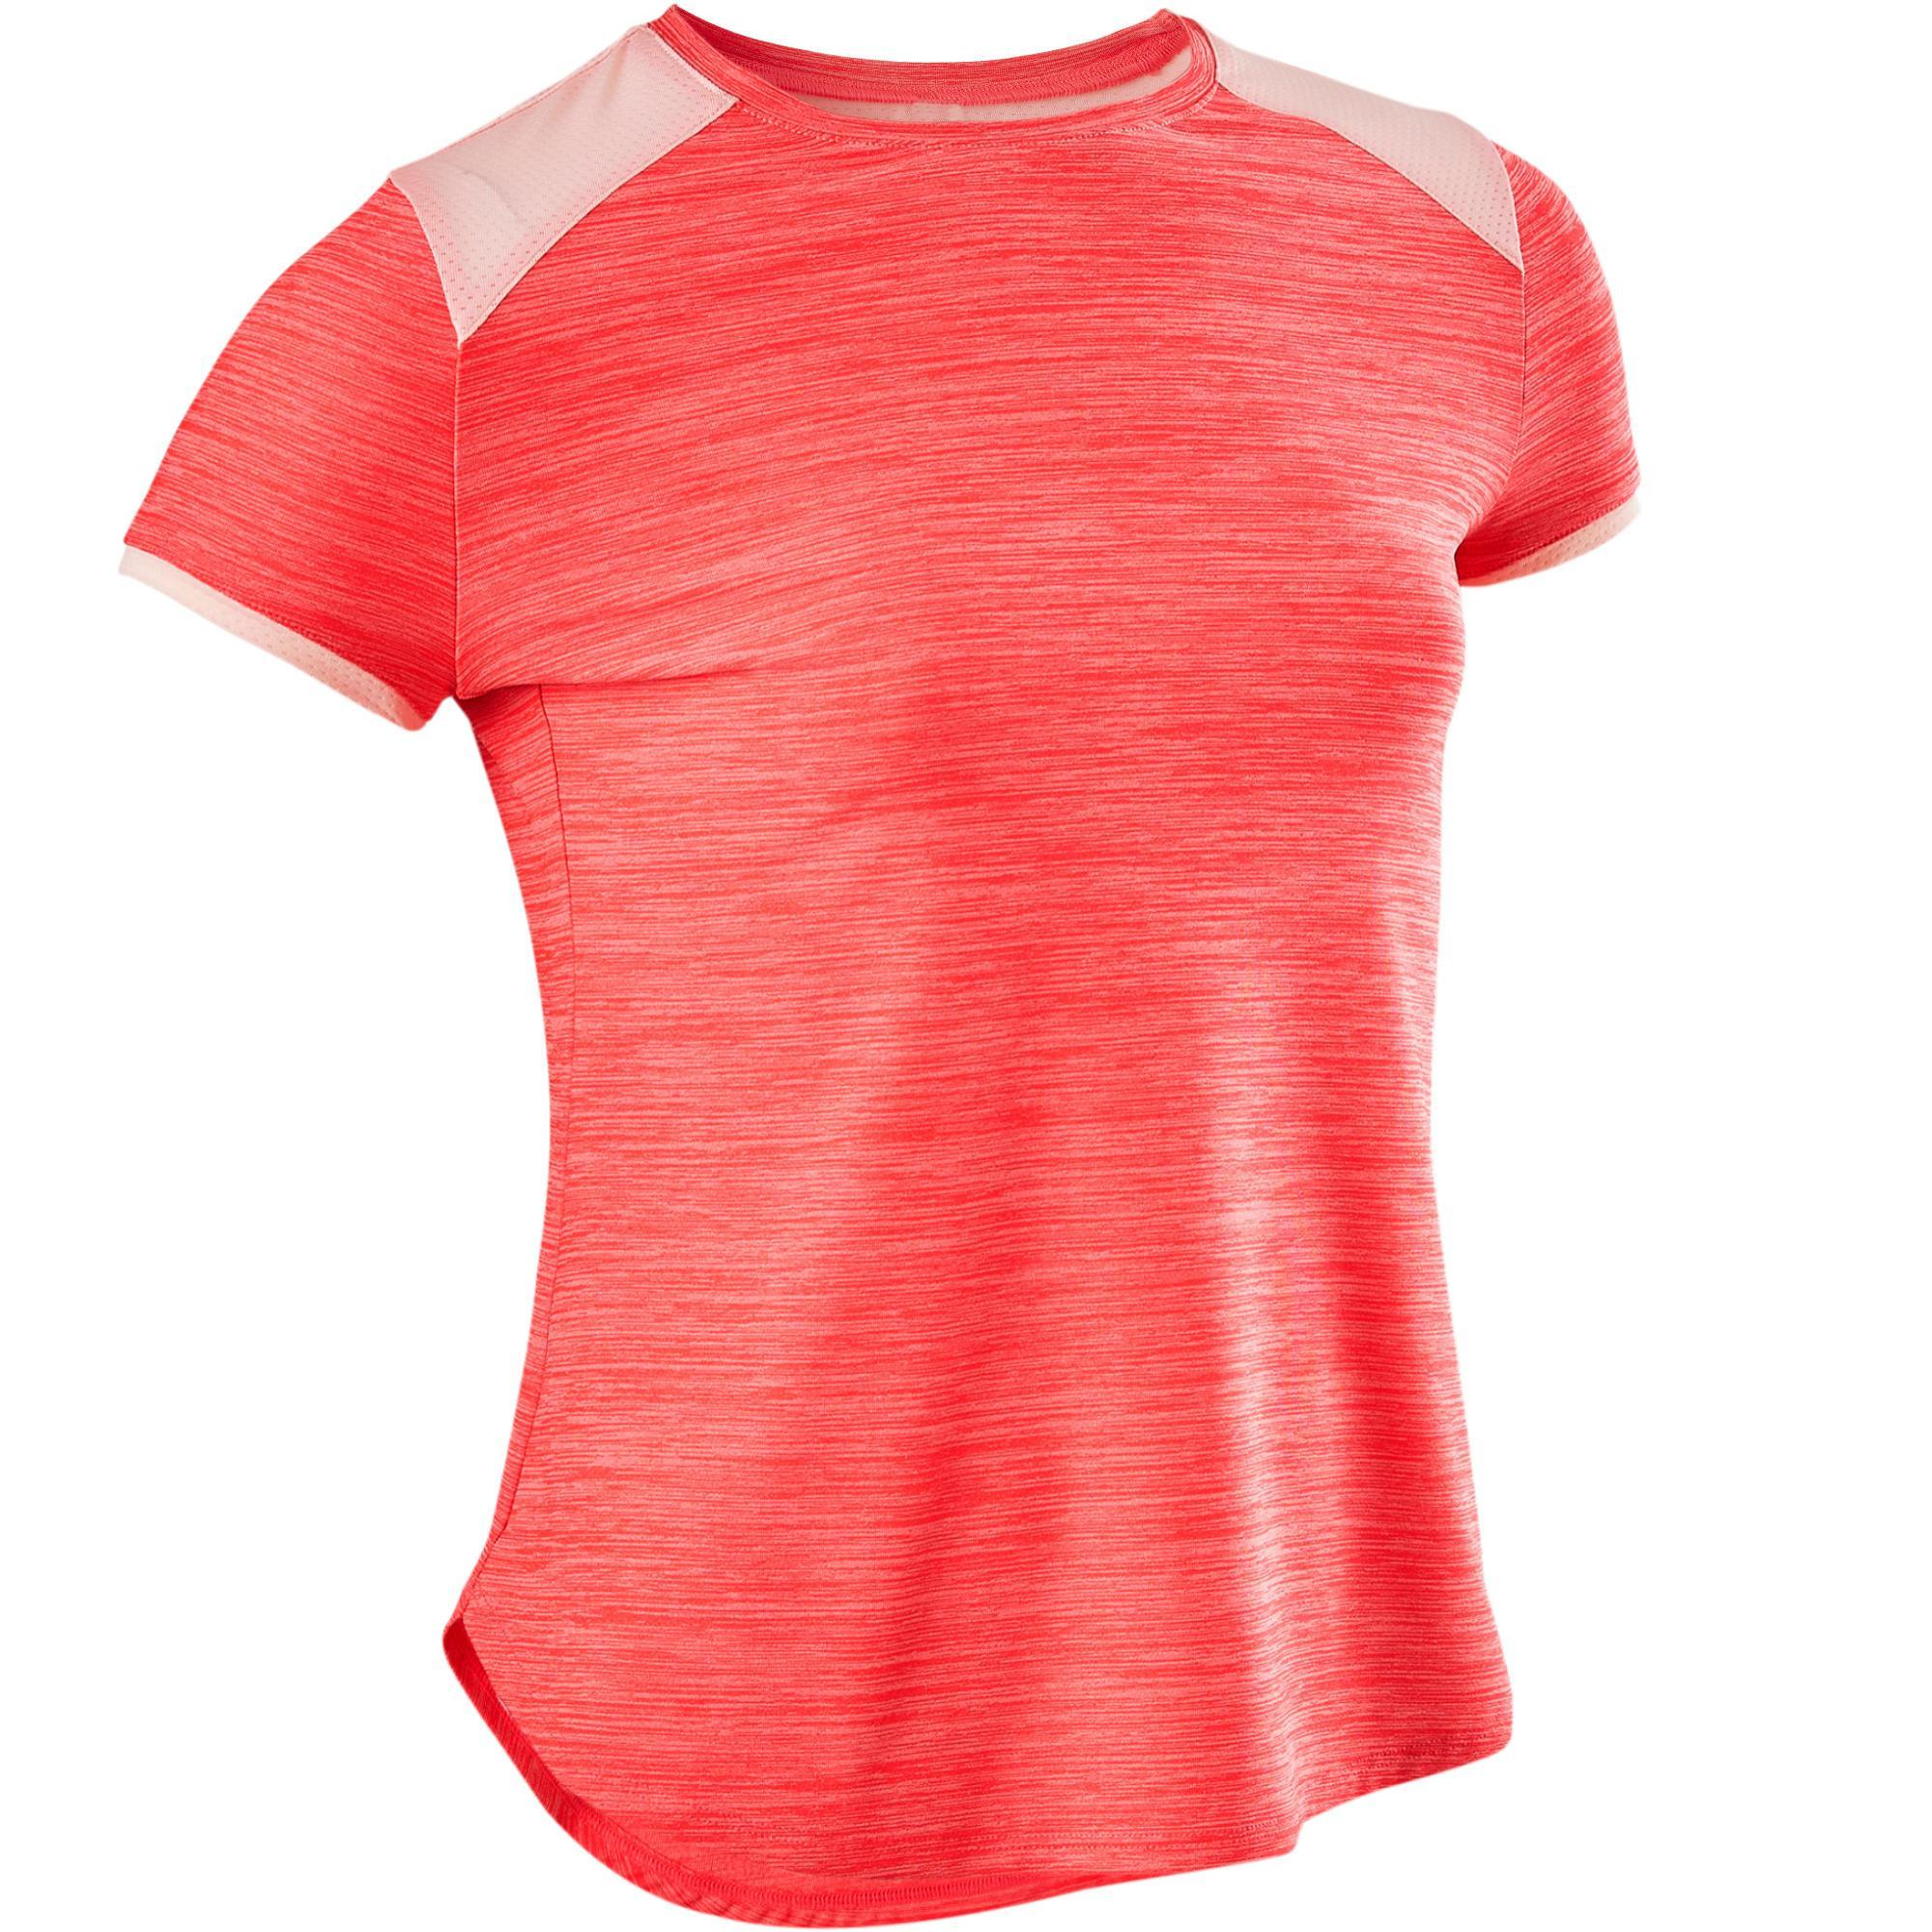 Domyos T-shirt korte mouwen ademend S500 meisjes GYM KINDEREN roze